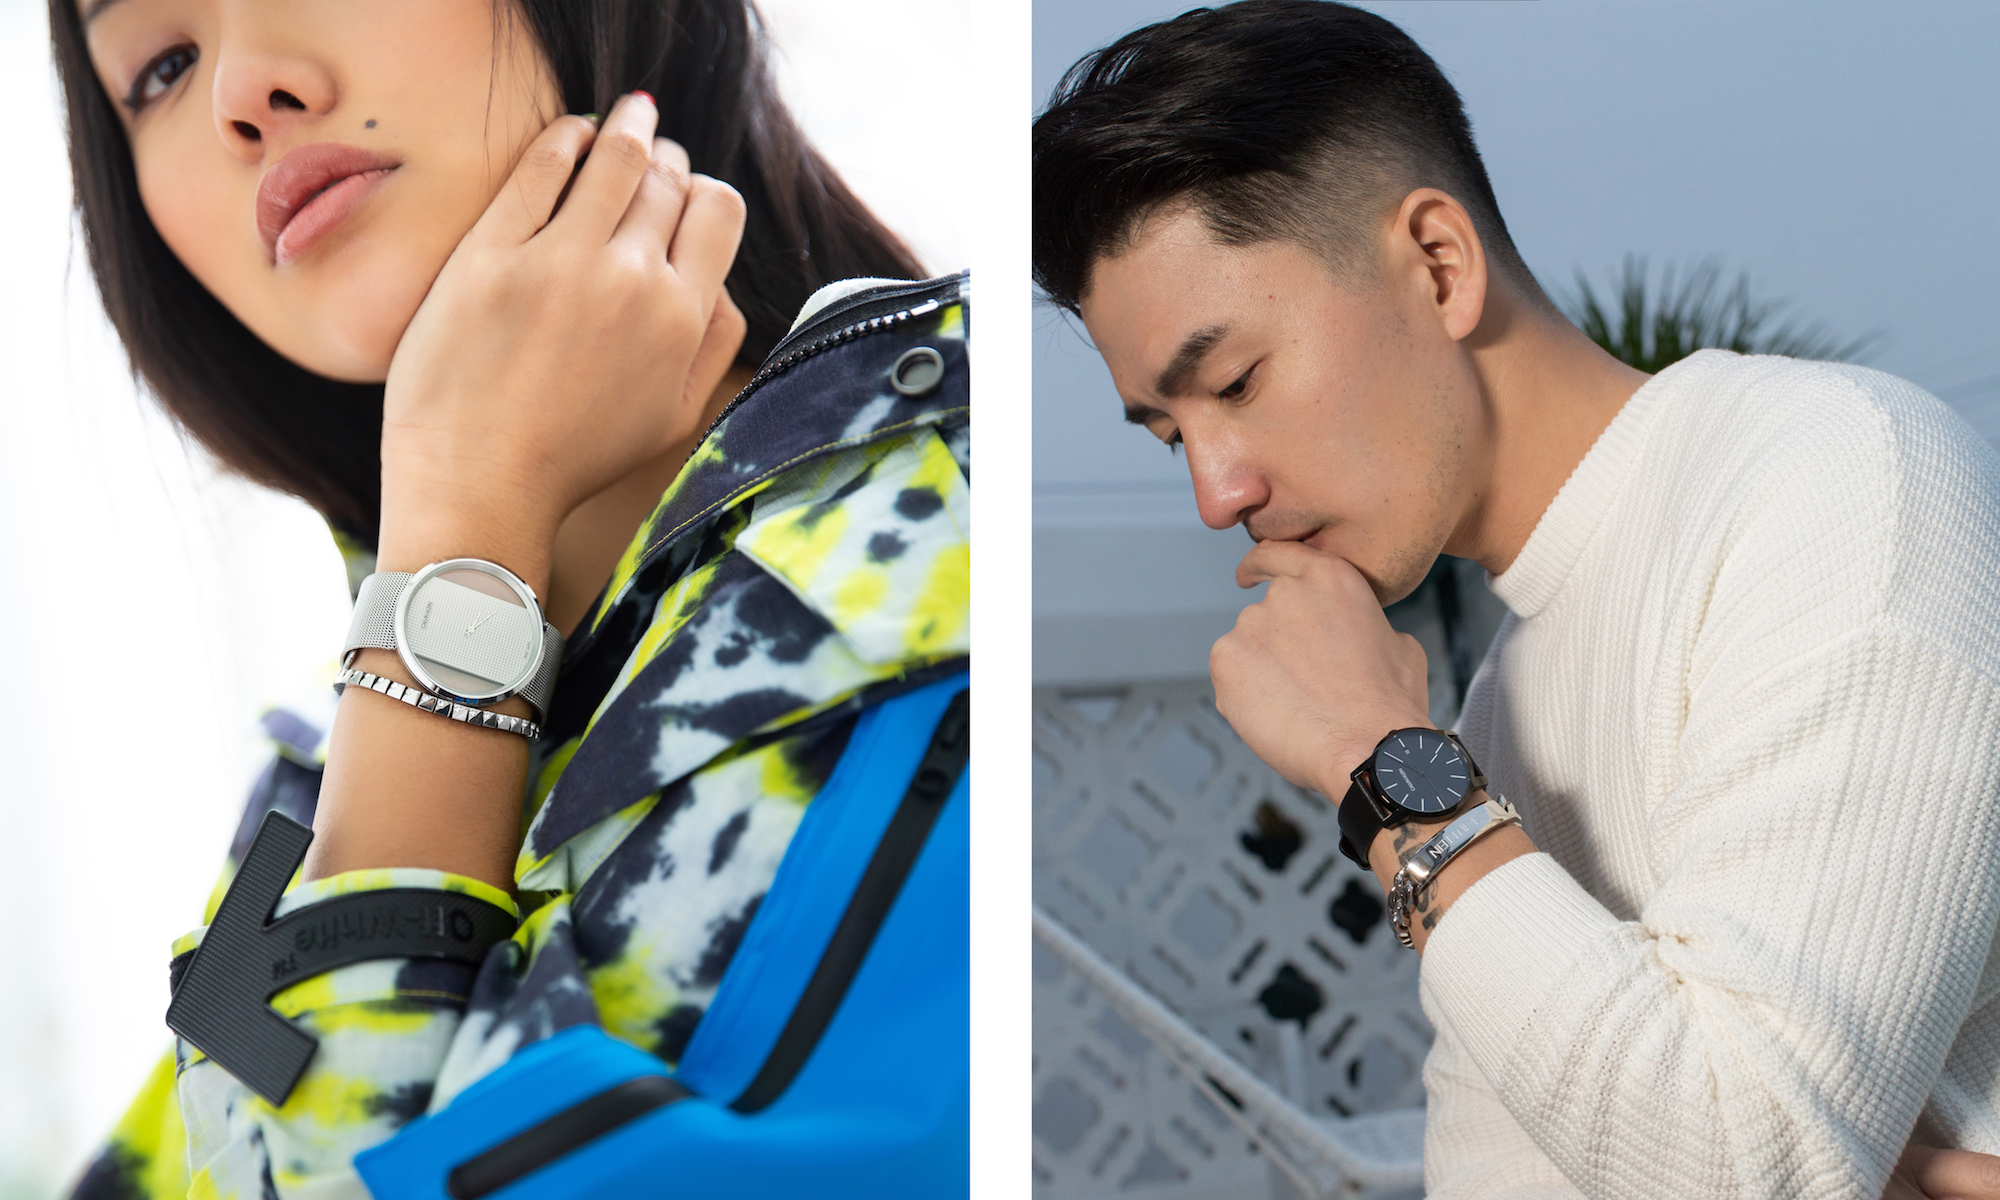 CALVIN KLEIN 呈献 2020 春夏新款腕表与配饰